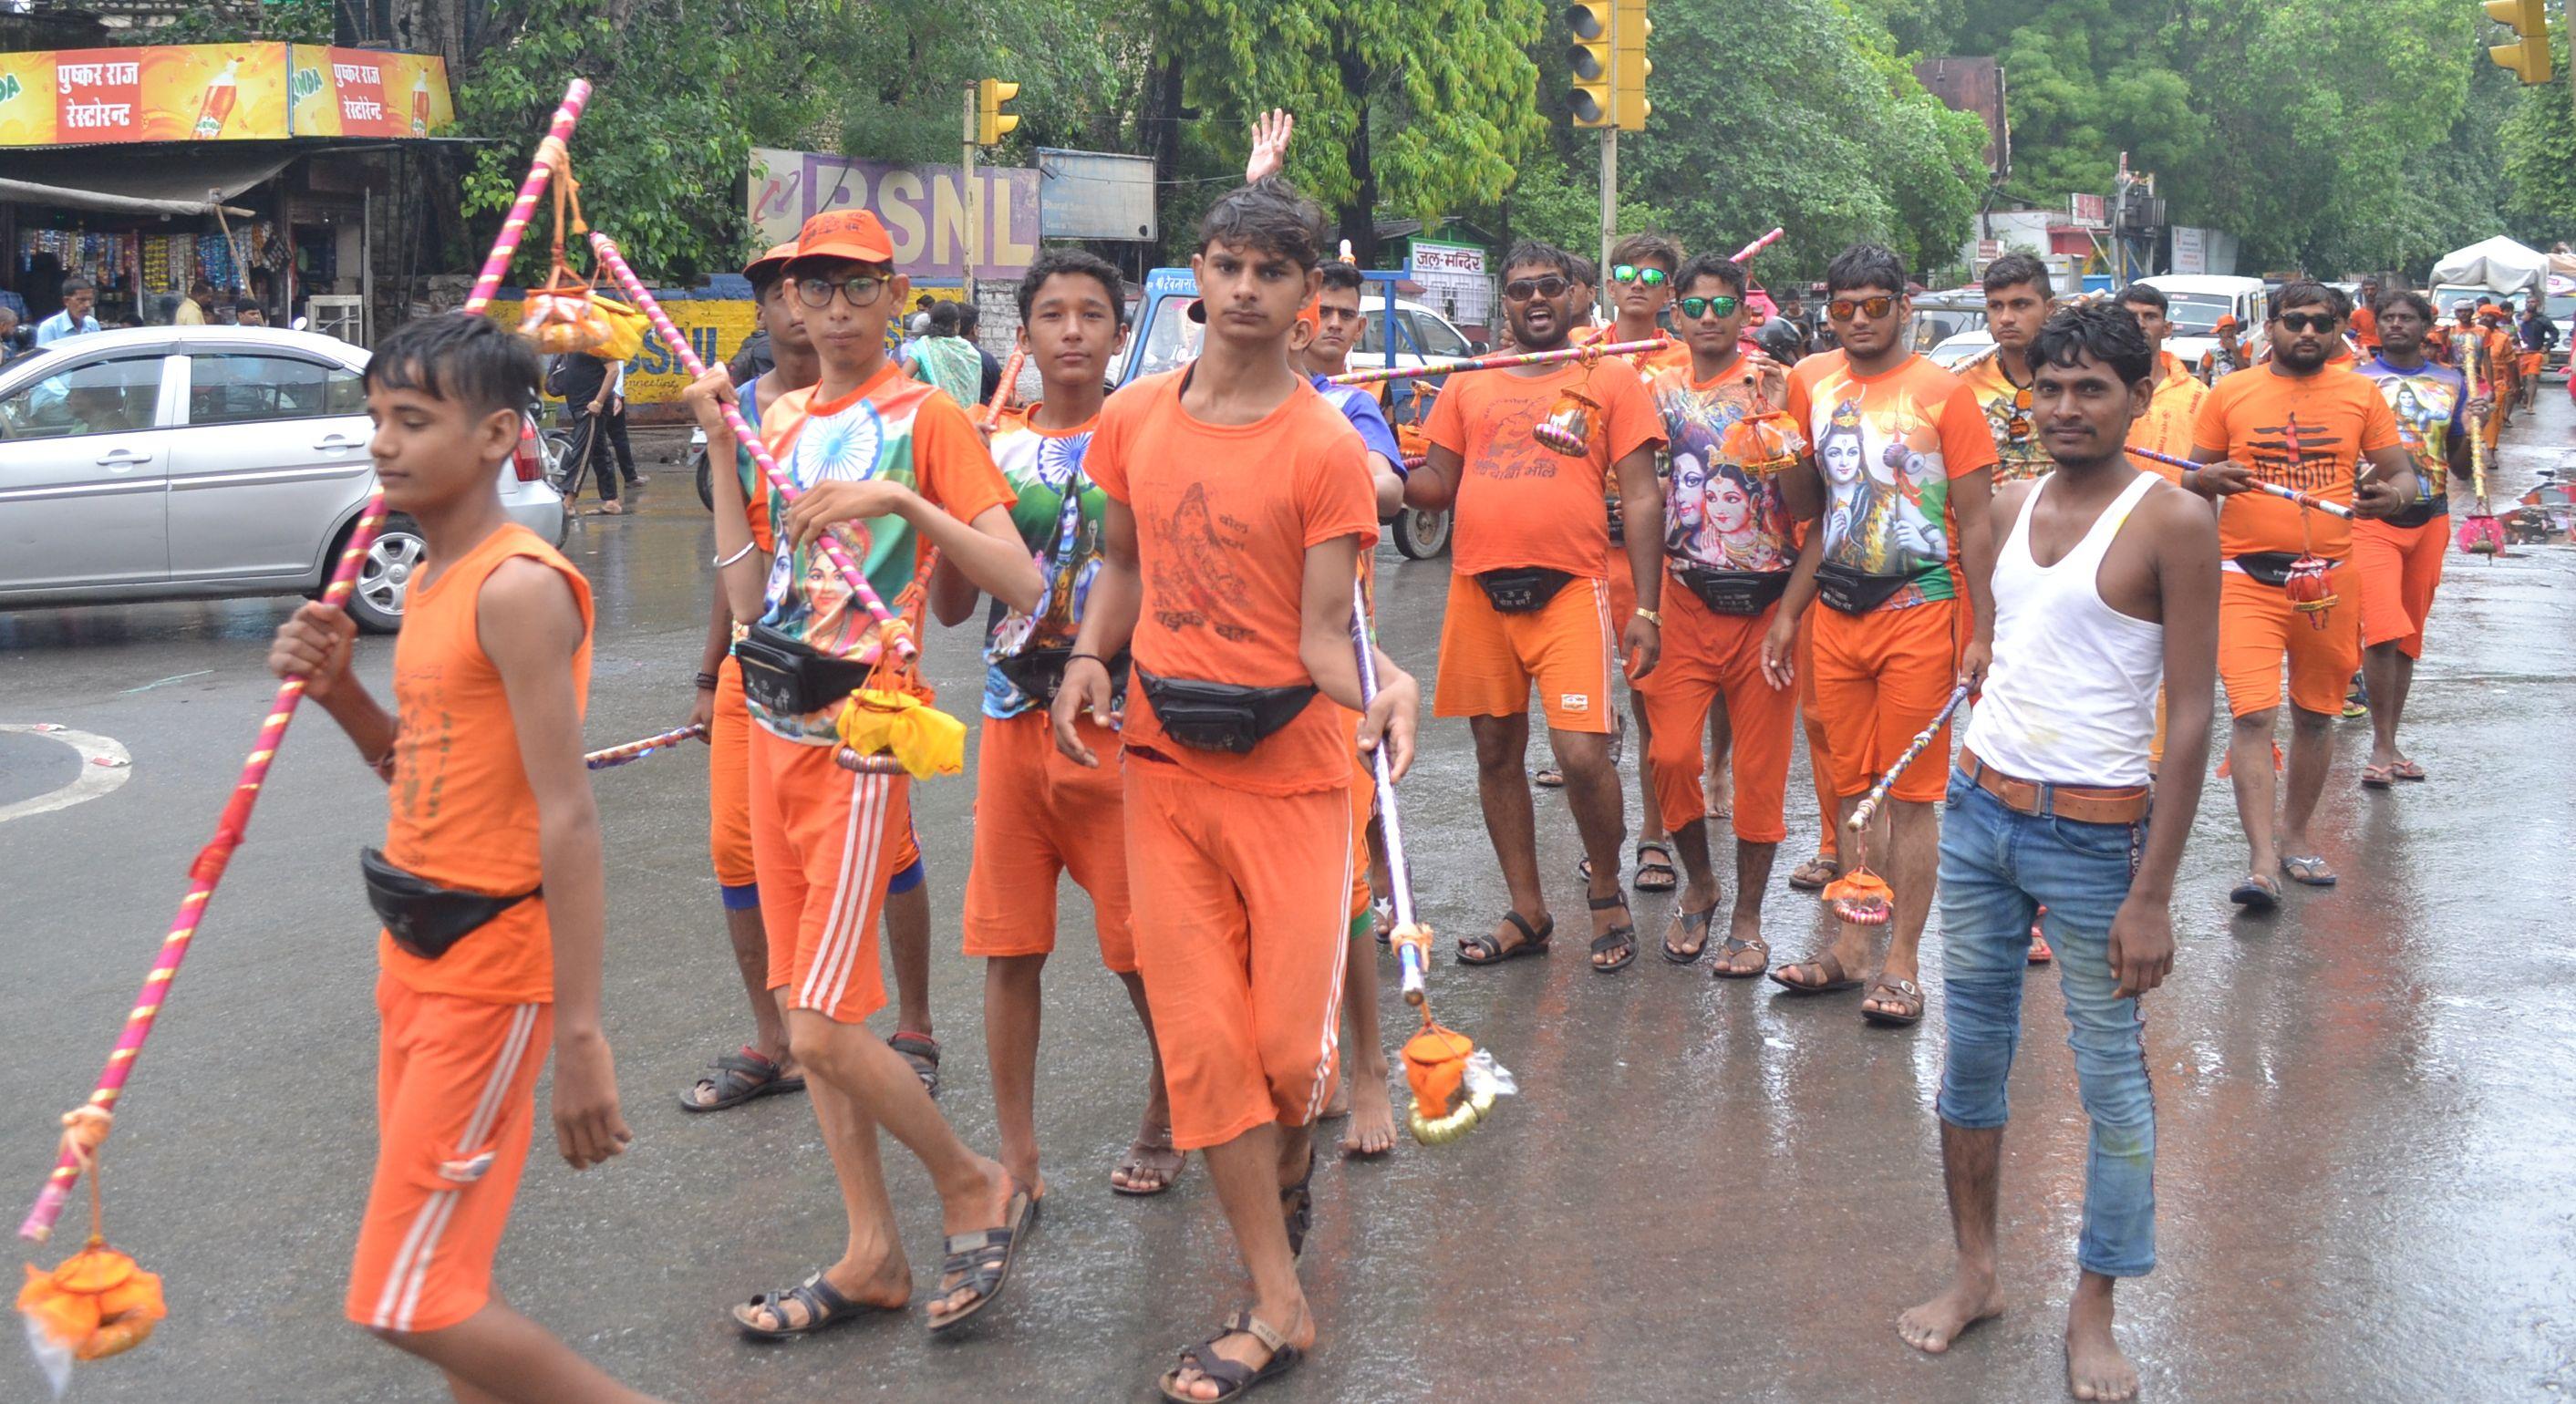 Shiv pujan: निकली कावड़ यात्रा, मंत्रोच्चार के साथ सहस्रधारा